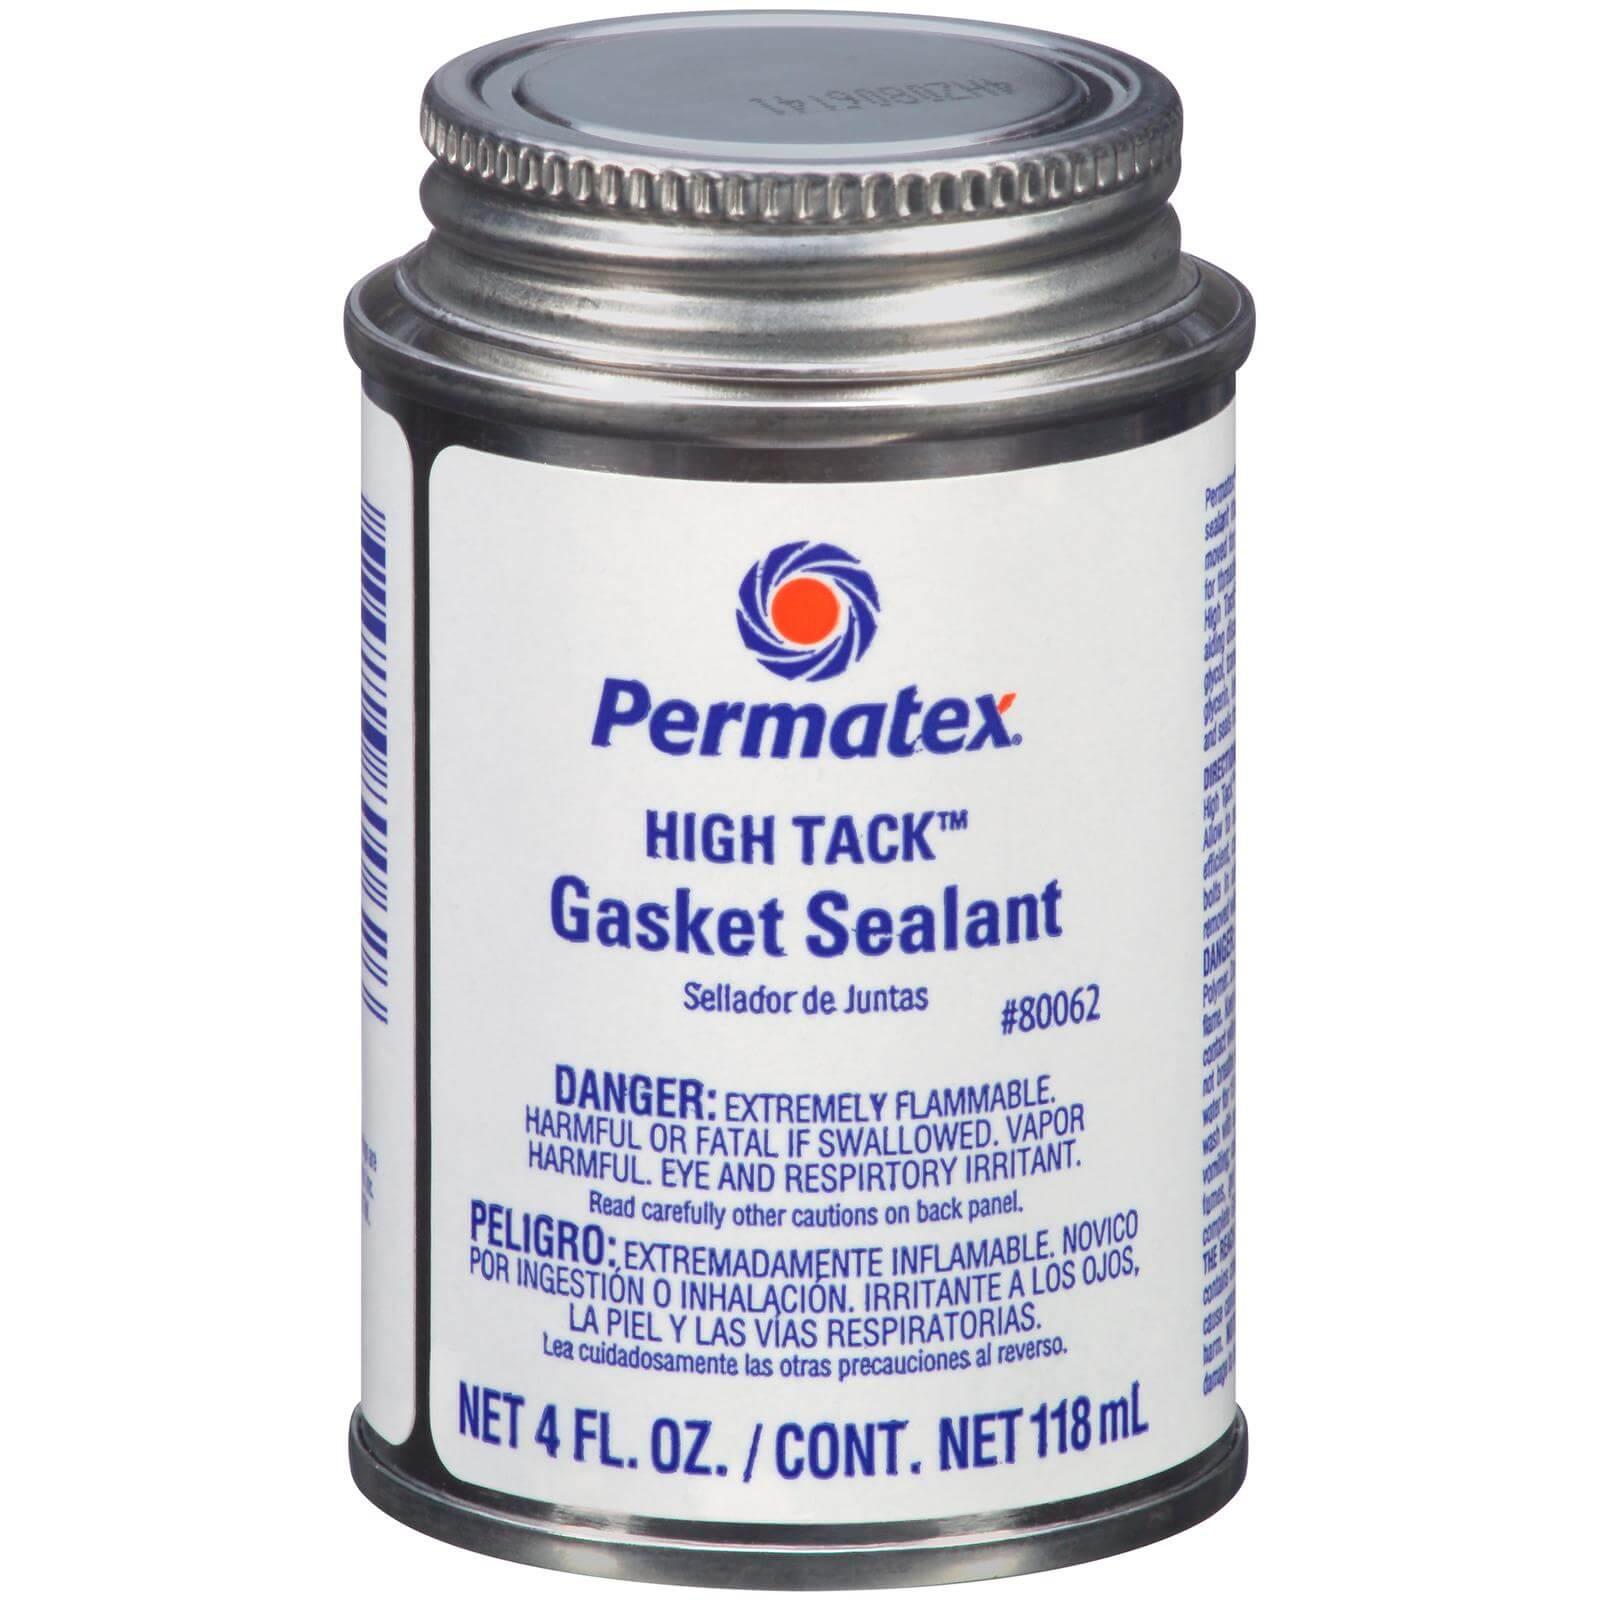 Permatex-Gasket-Sealant